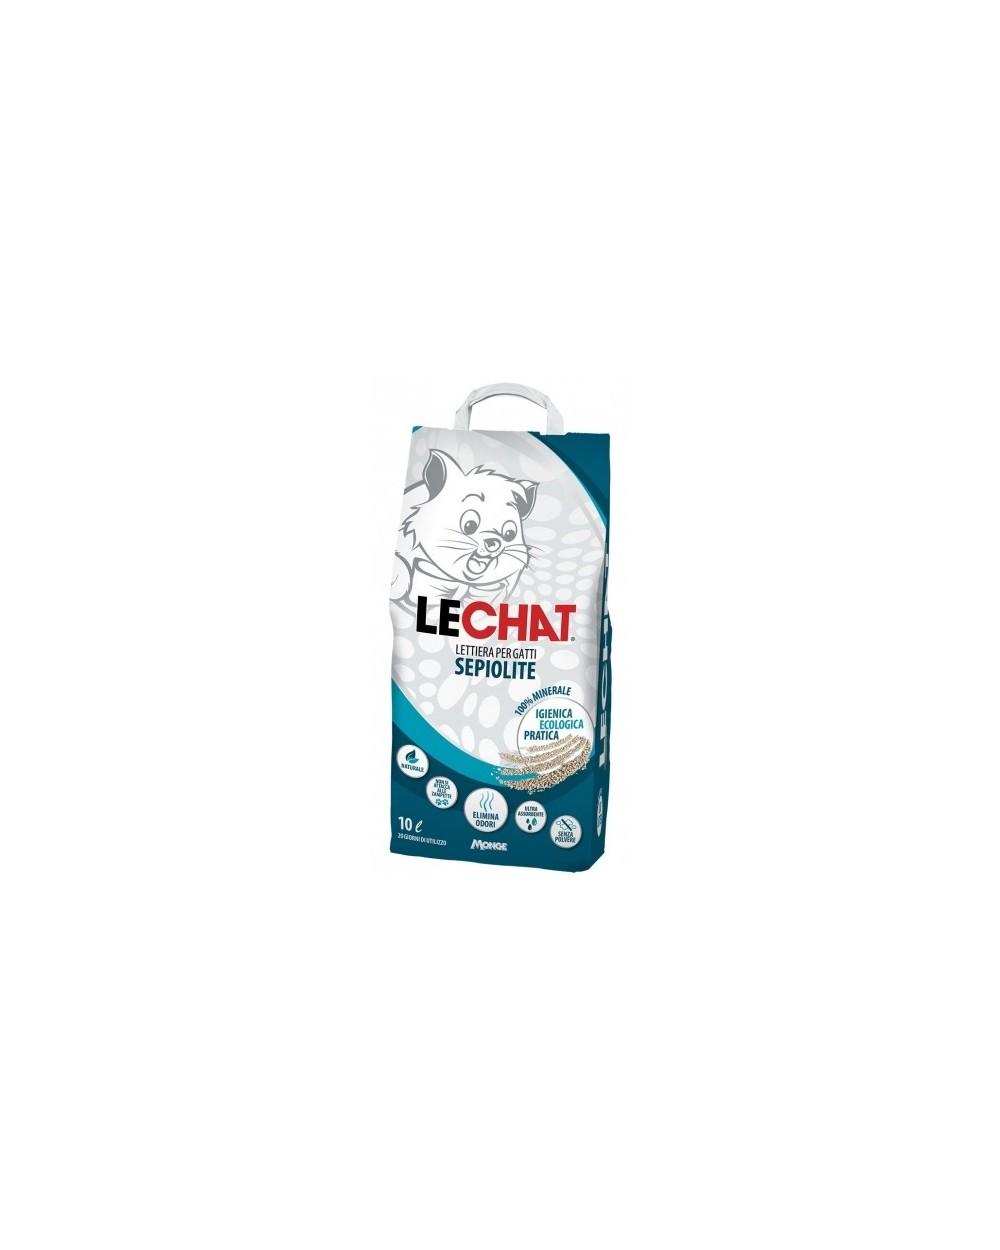 Lechat Lettiera Classic Sepiolite